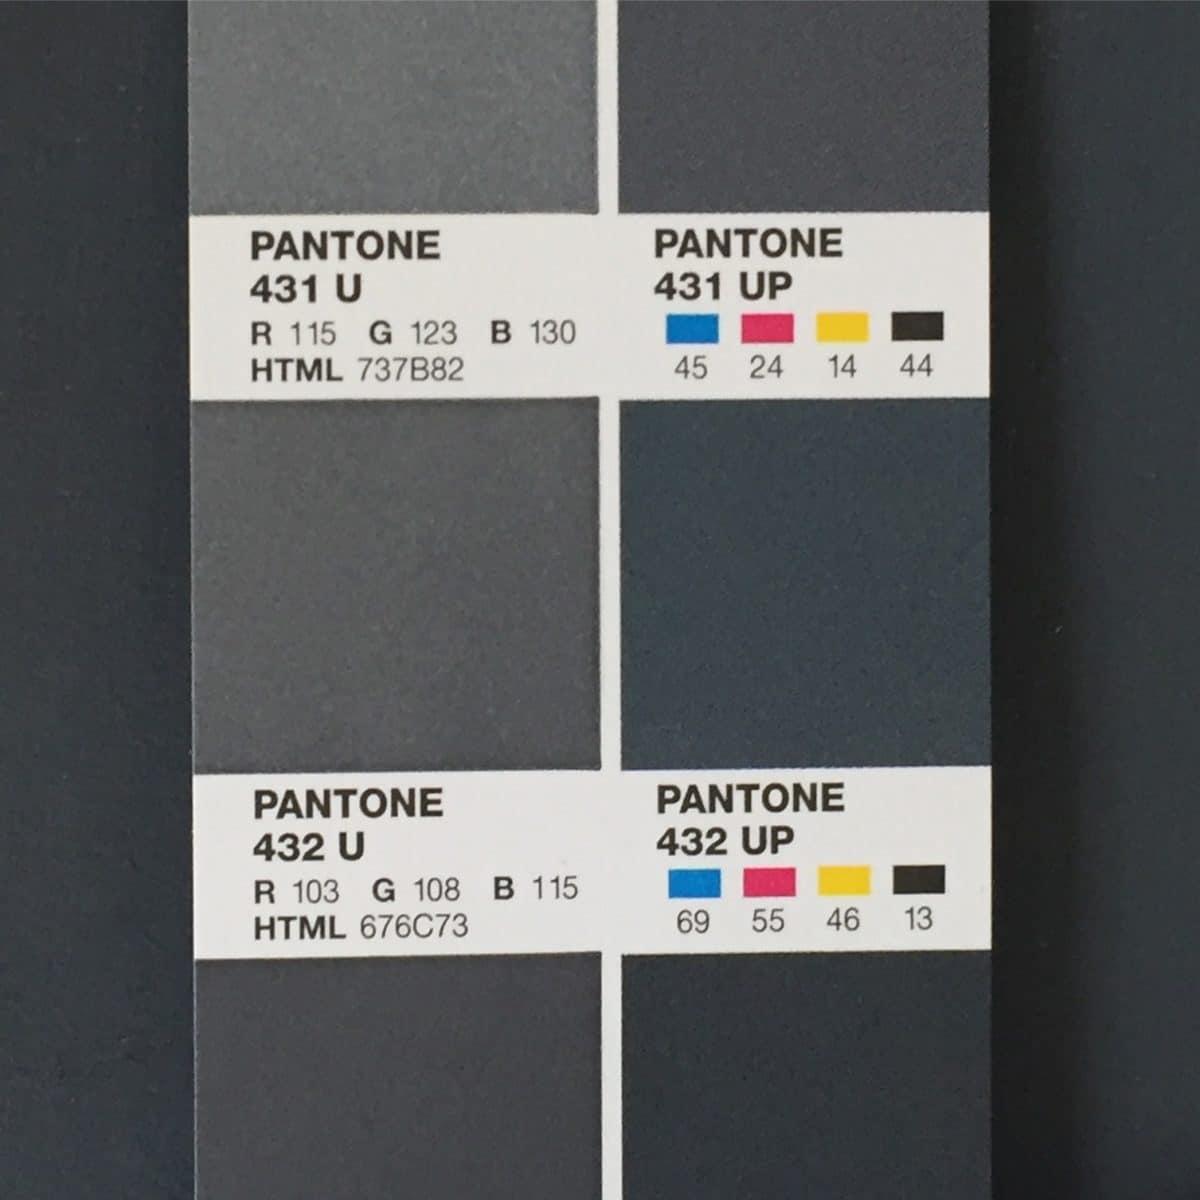 Work In Progress — Pantone.432.#graphics #pantone #design #agencylife #graphicdesigner #graphicdesign #igers #colour #igersoftheday #designer #colours #graphicdesign #art #artdirection  #grafik #Branding #brandingagency #Brand